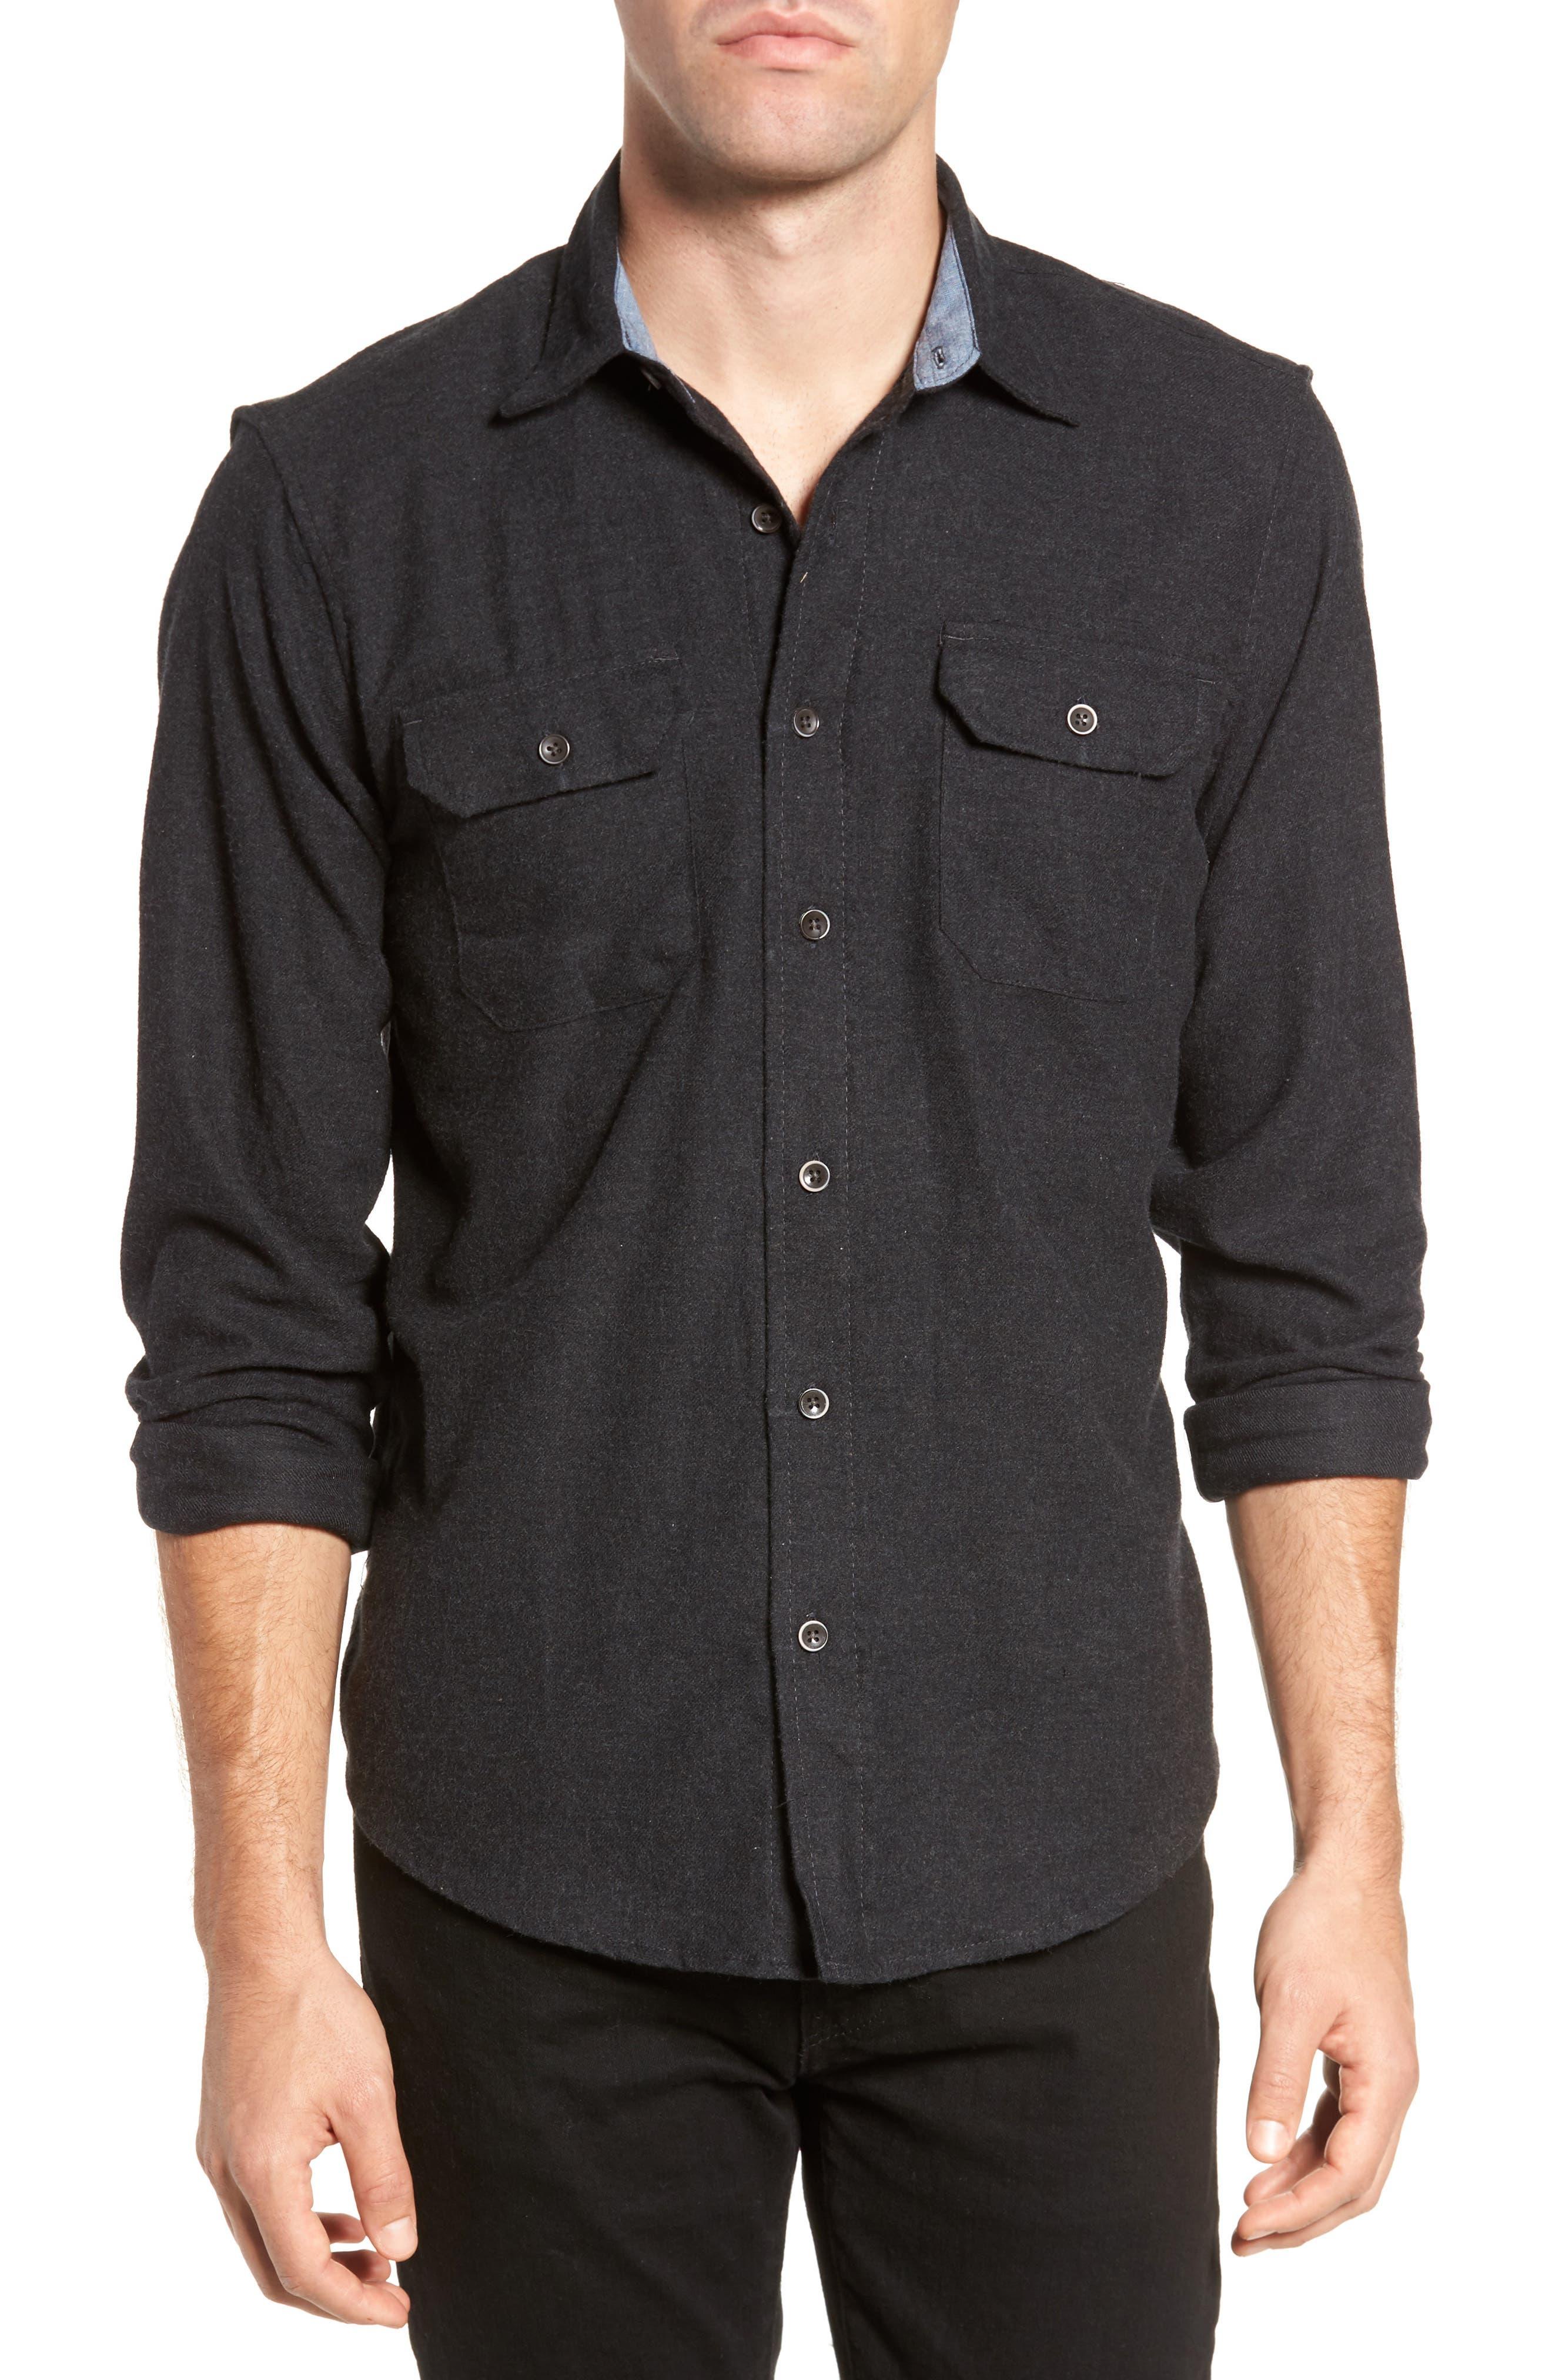 Tailor Vintage Heather Flannel Shirt